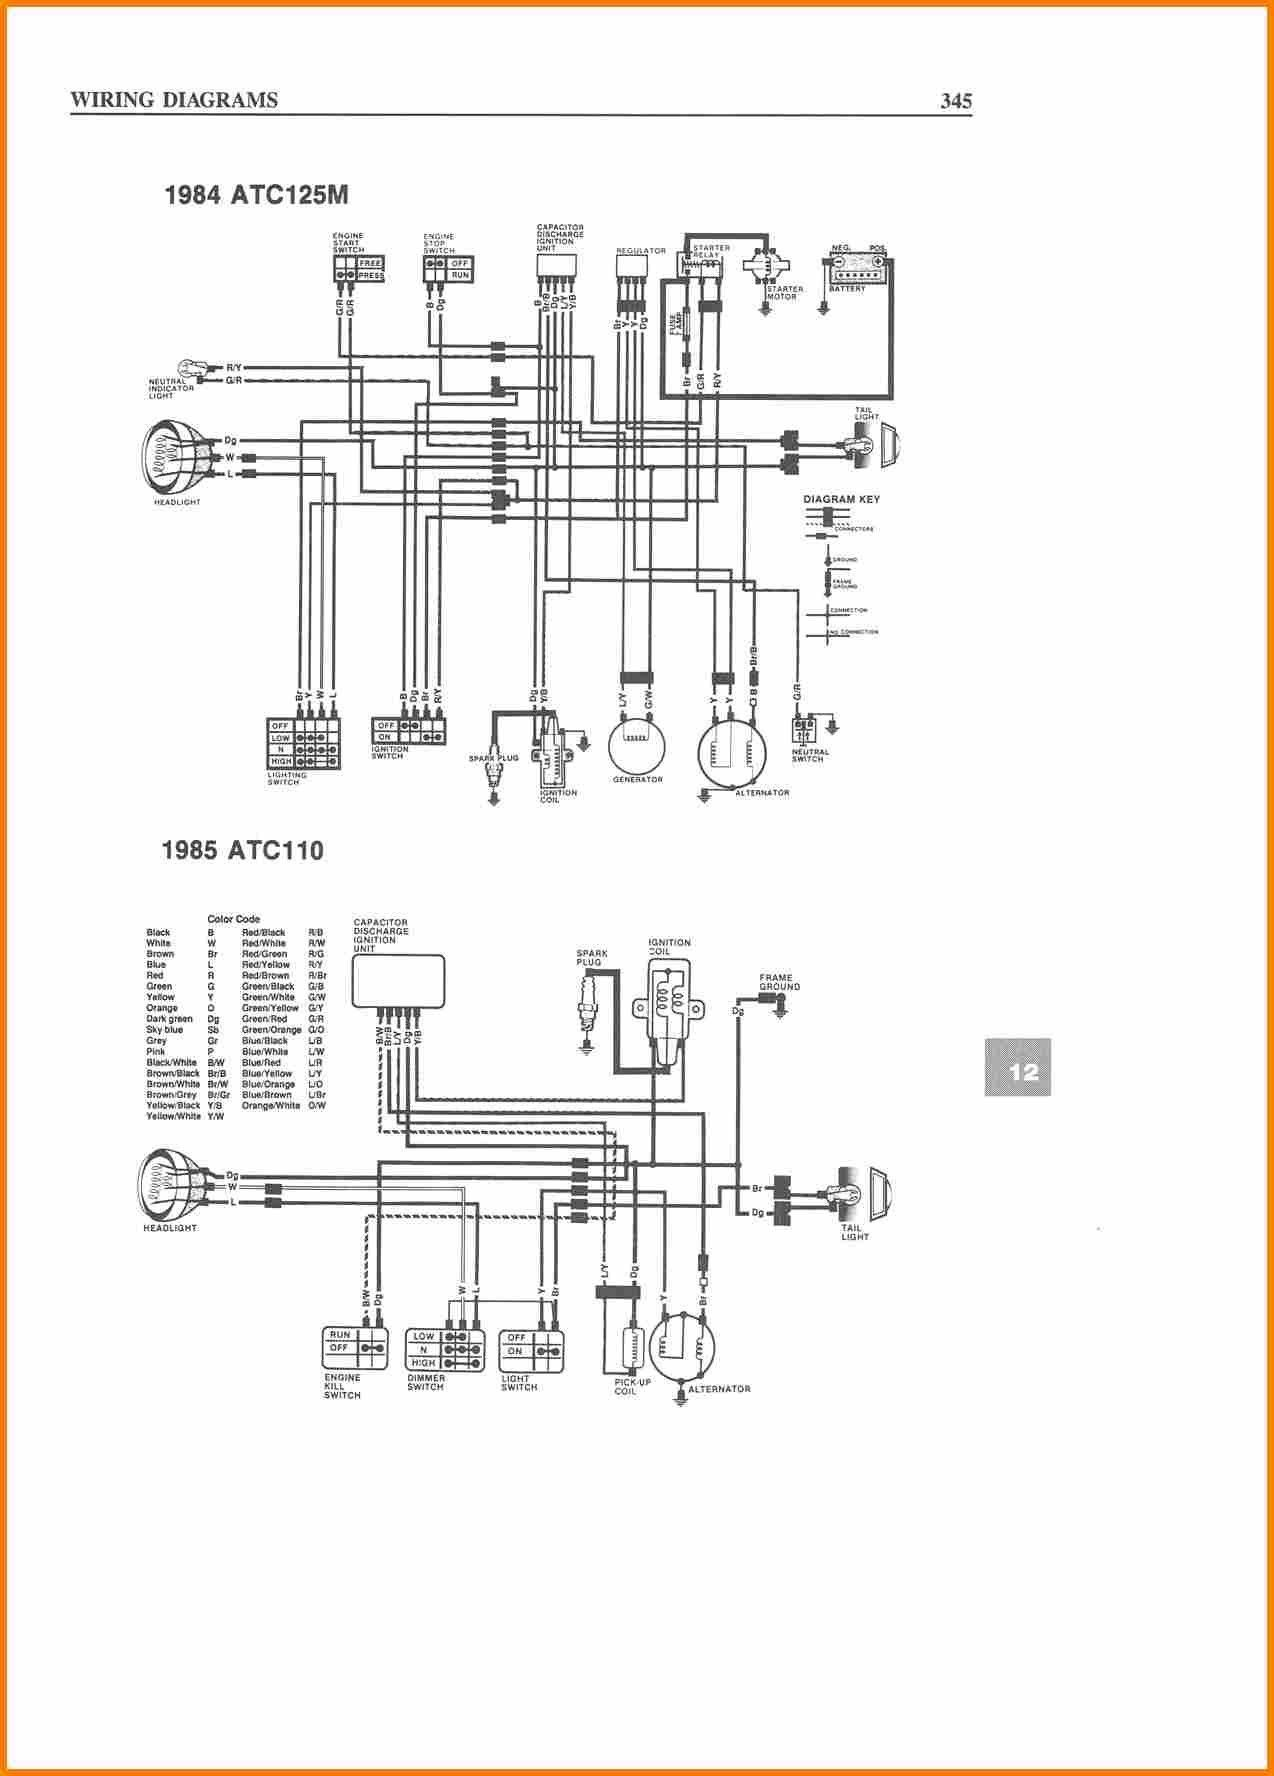 Chinese atv Wiring Schematic 110cc Bearcat 110cc atv Wiring Diagram Wiring Diagrams Schematics Of Chinese atv Wiring Schematic 110cc